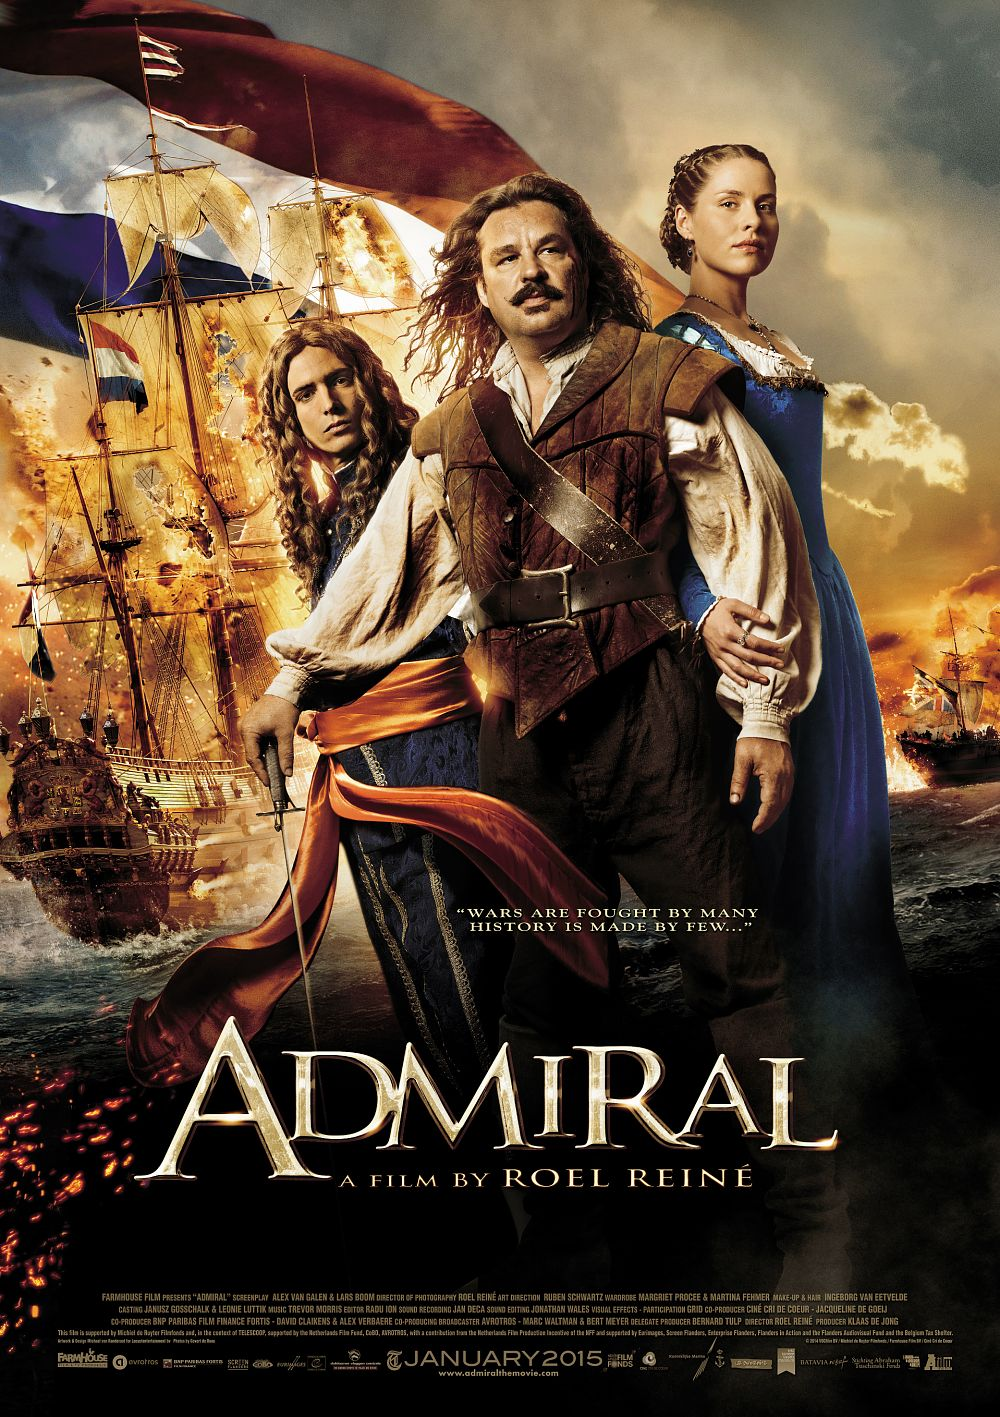 Michiel de Ruyter (Admiral) / admirali / ადმირალი